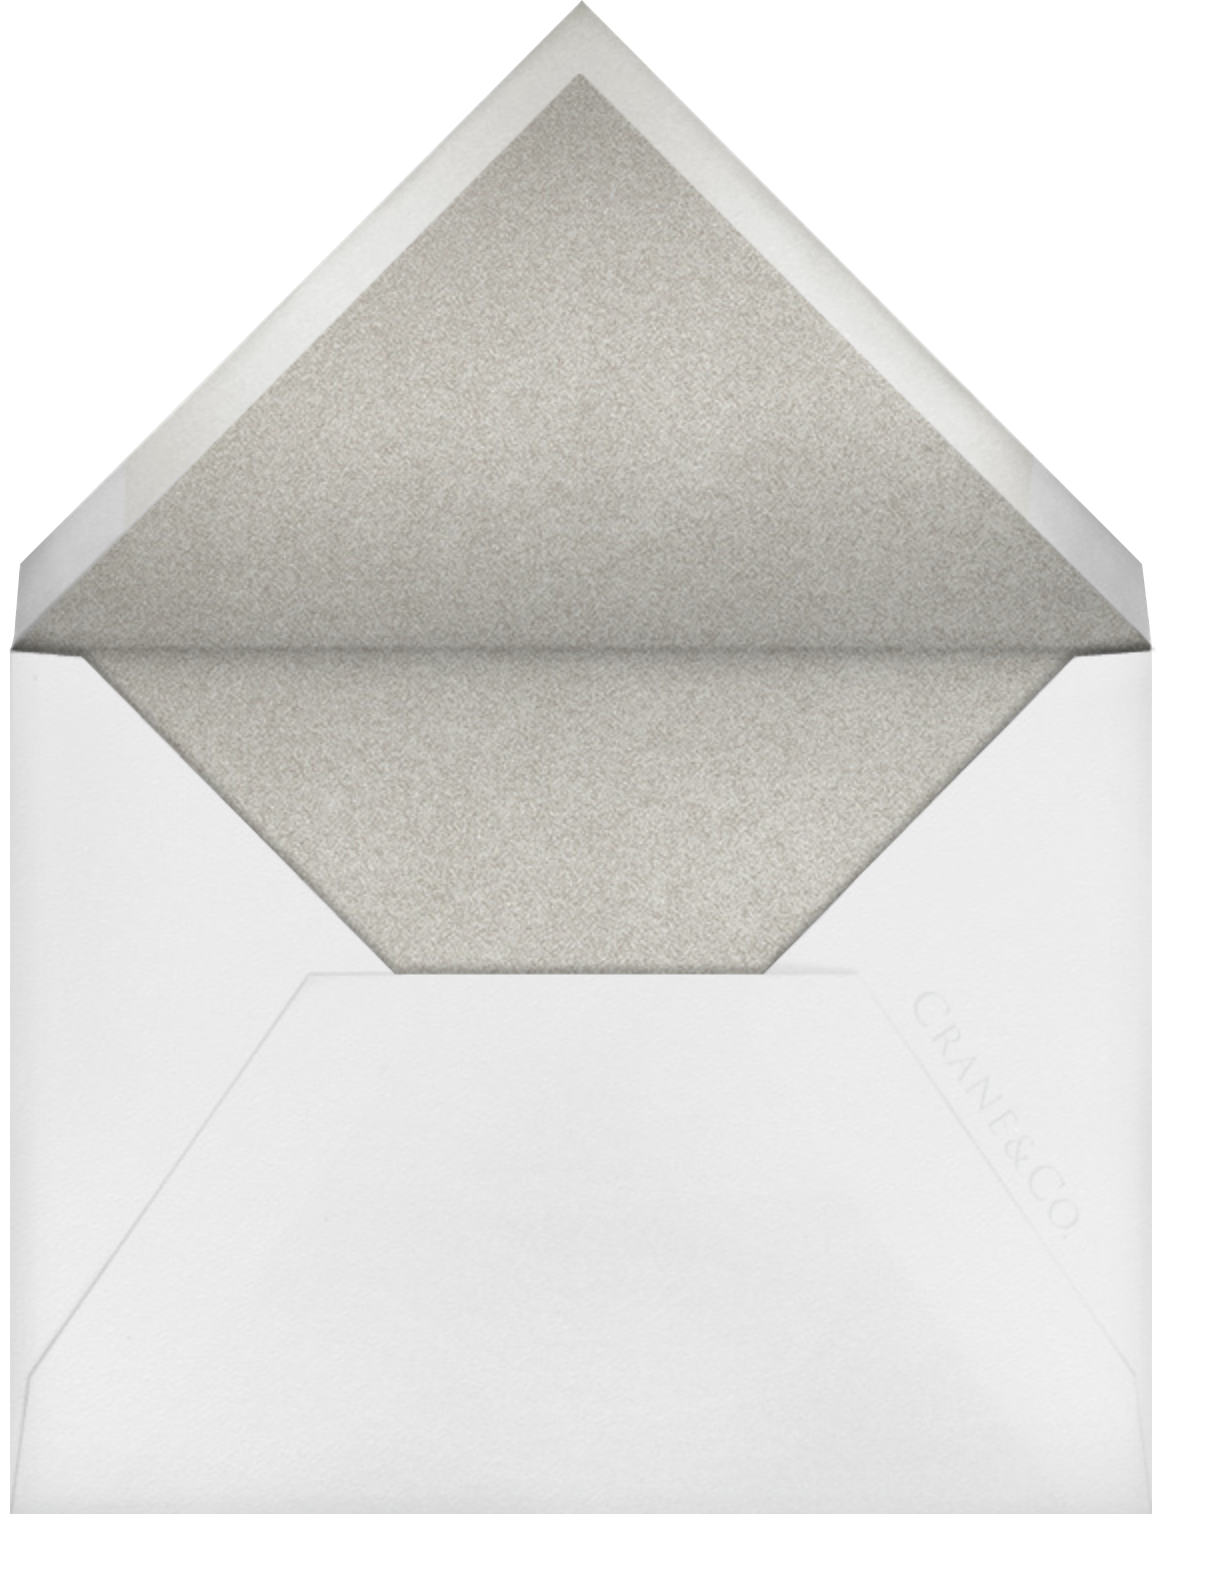 Simcha - Paperless Post - All - envelope back